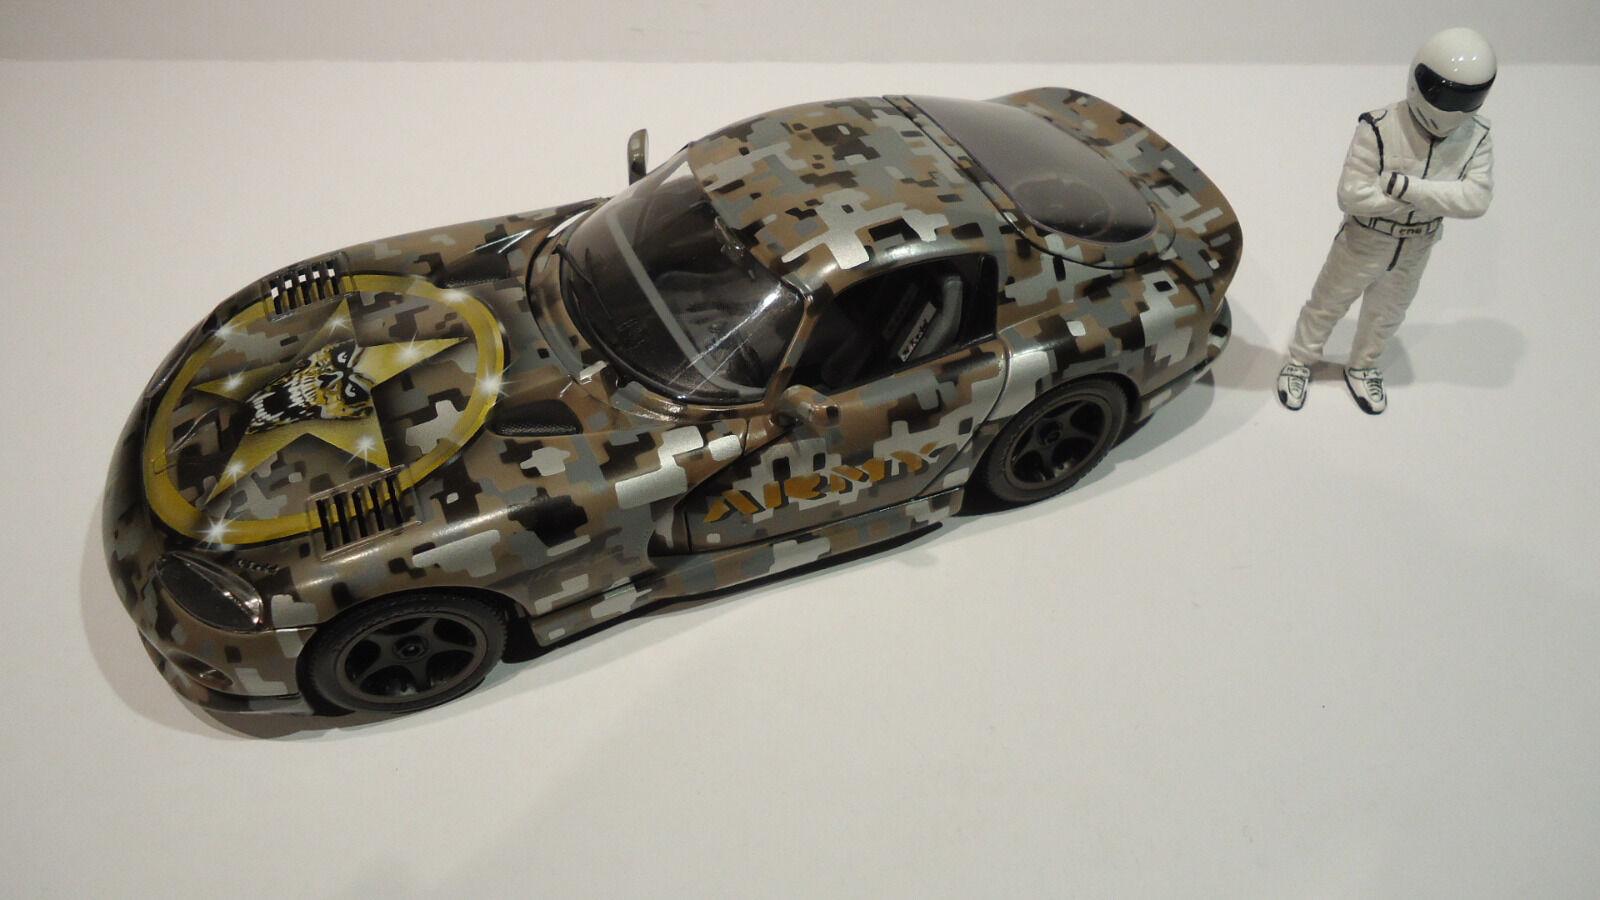 Bburago Dodge Viper GTS Coupe 1 18 Airbrush Tuning  Army Digital Camouflage   | Hervorragende Eigenschaften